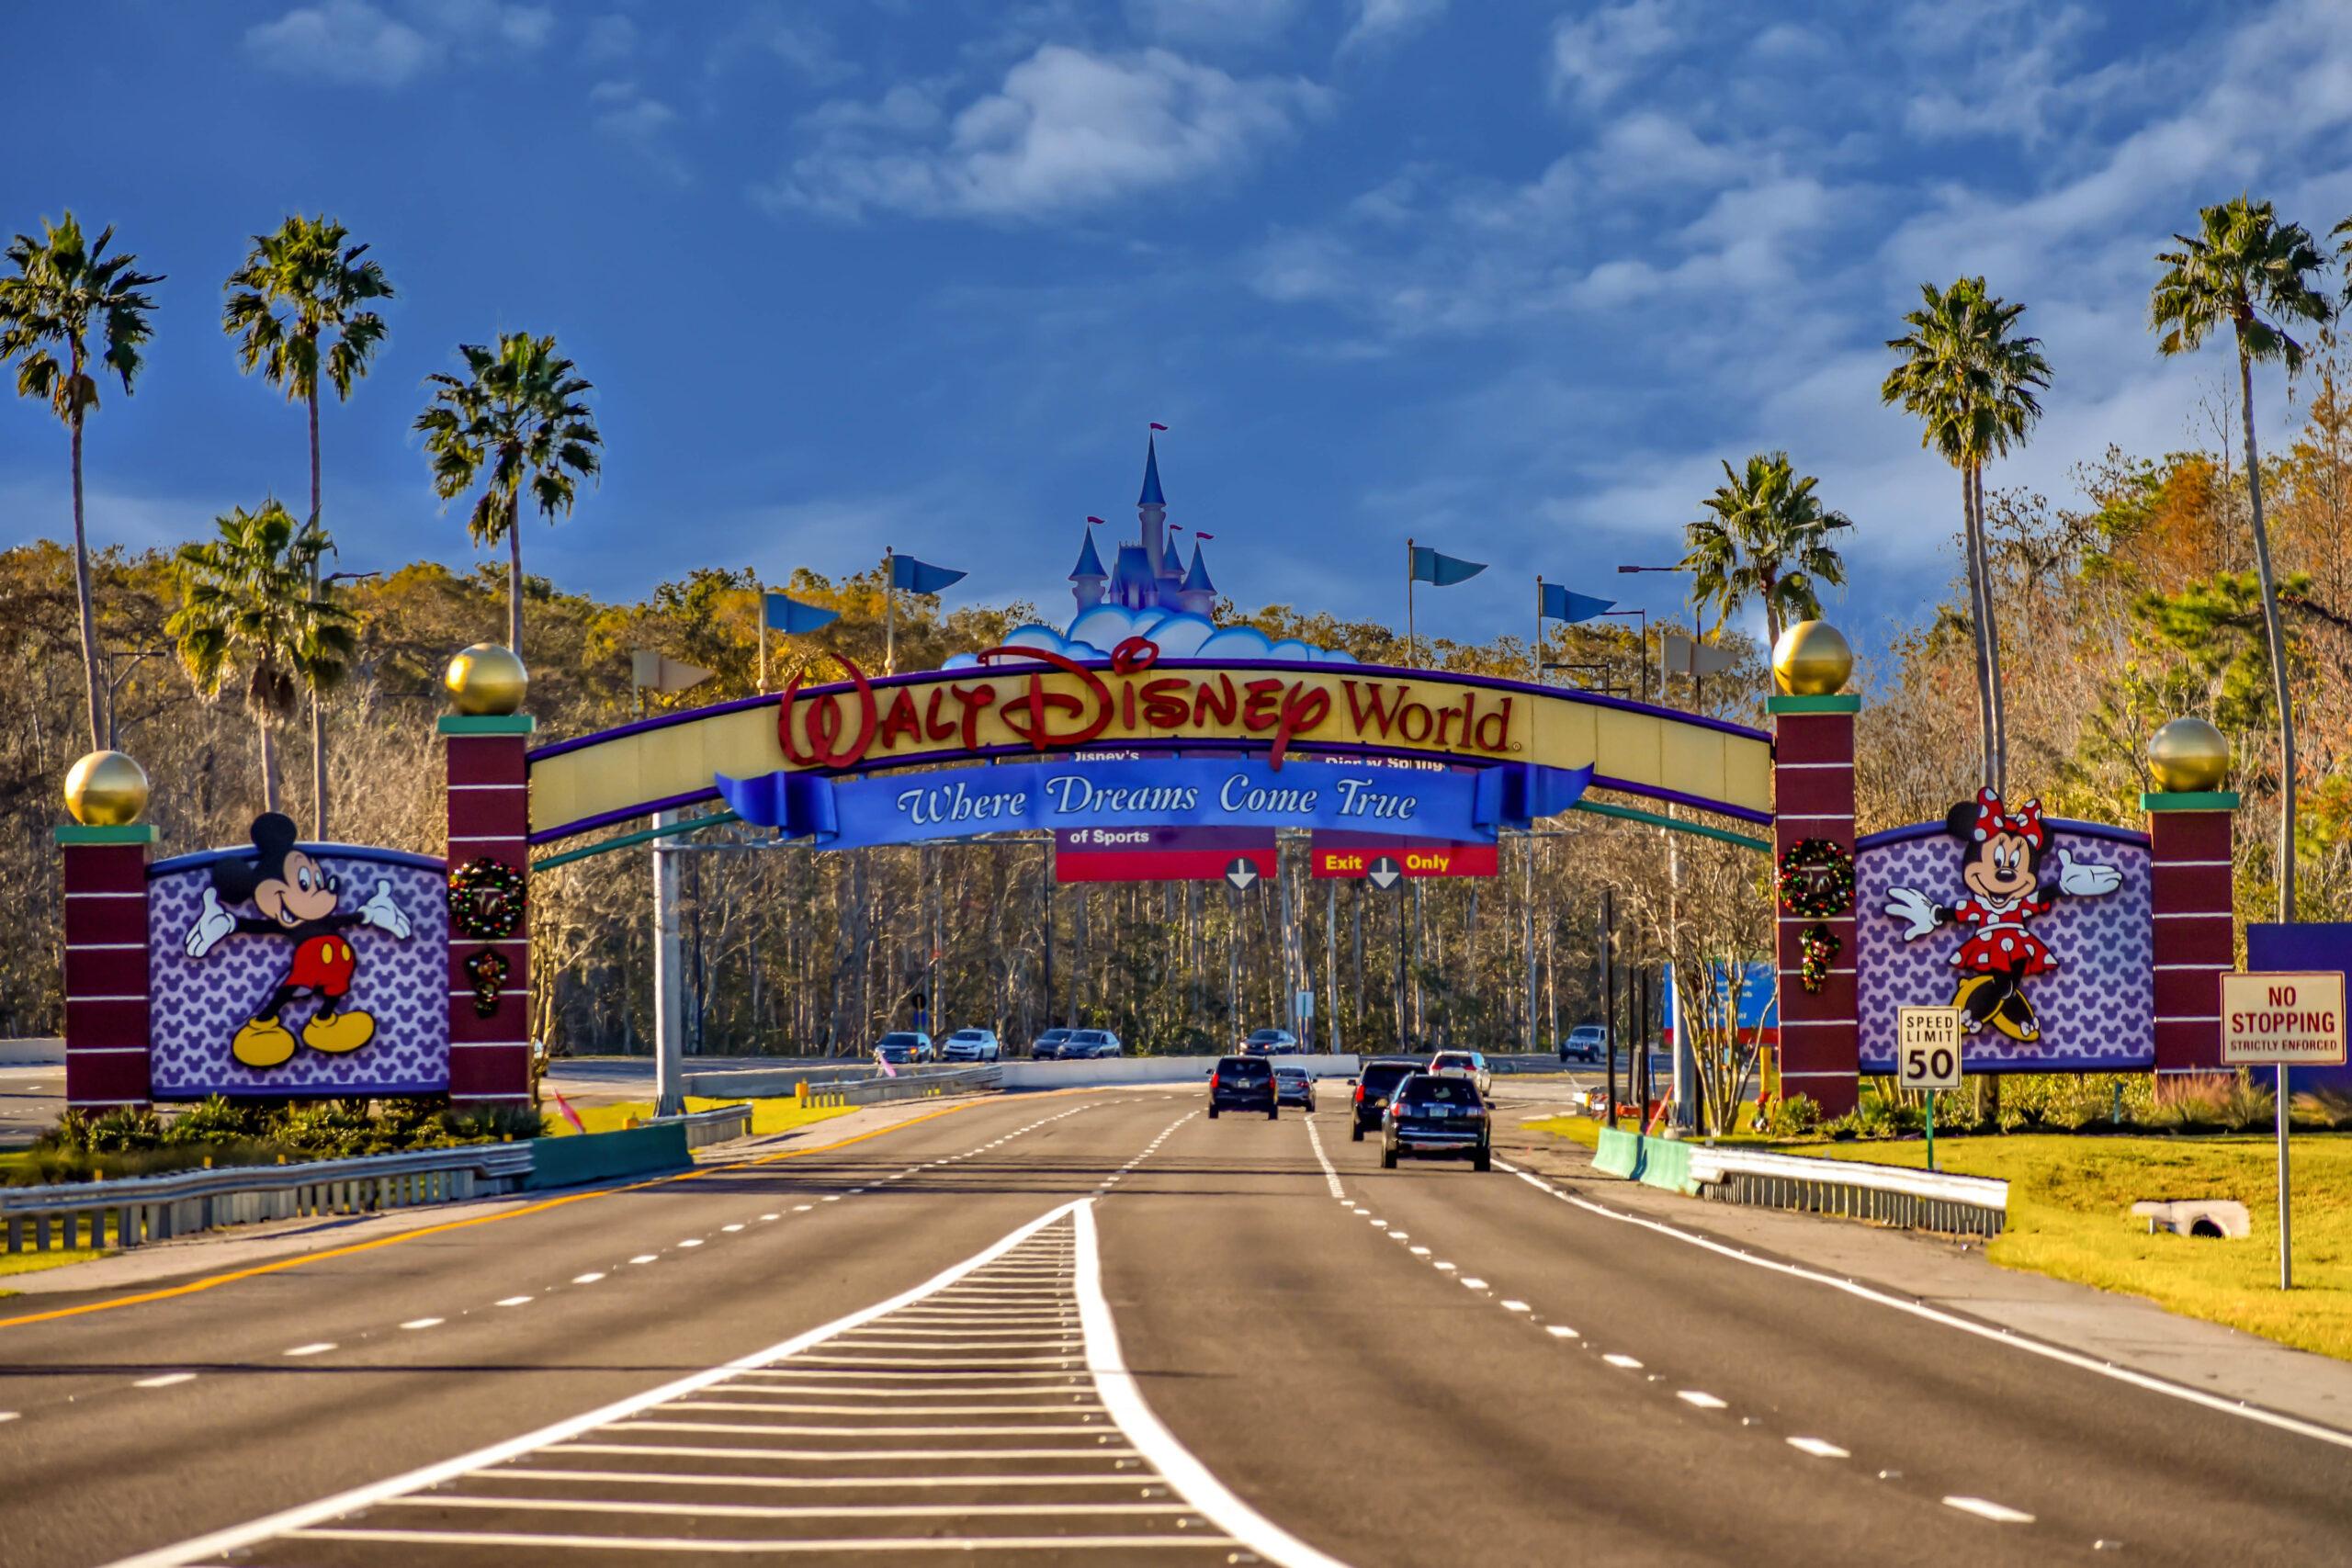 Entrance Arch of Walt Disney Theme Parks at Lake Buena Vista area.